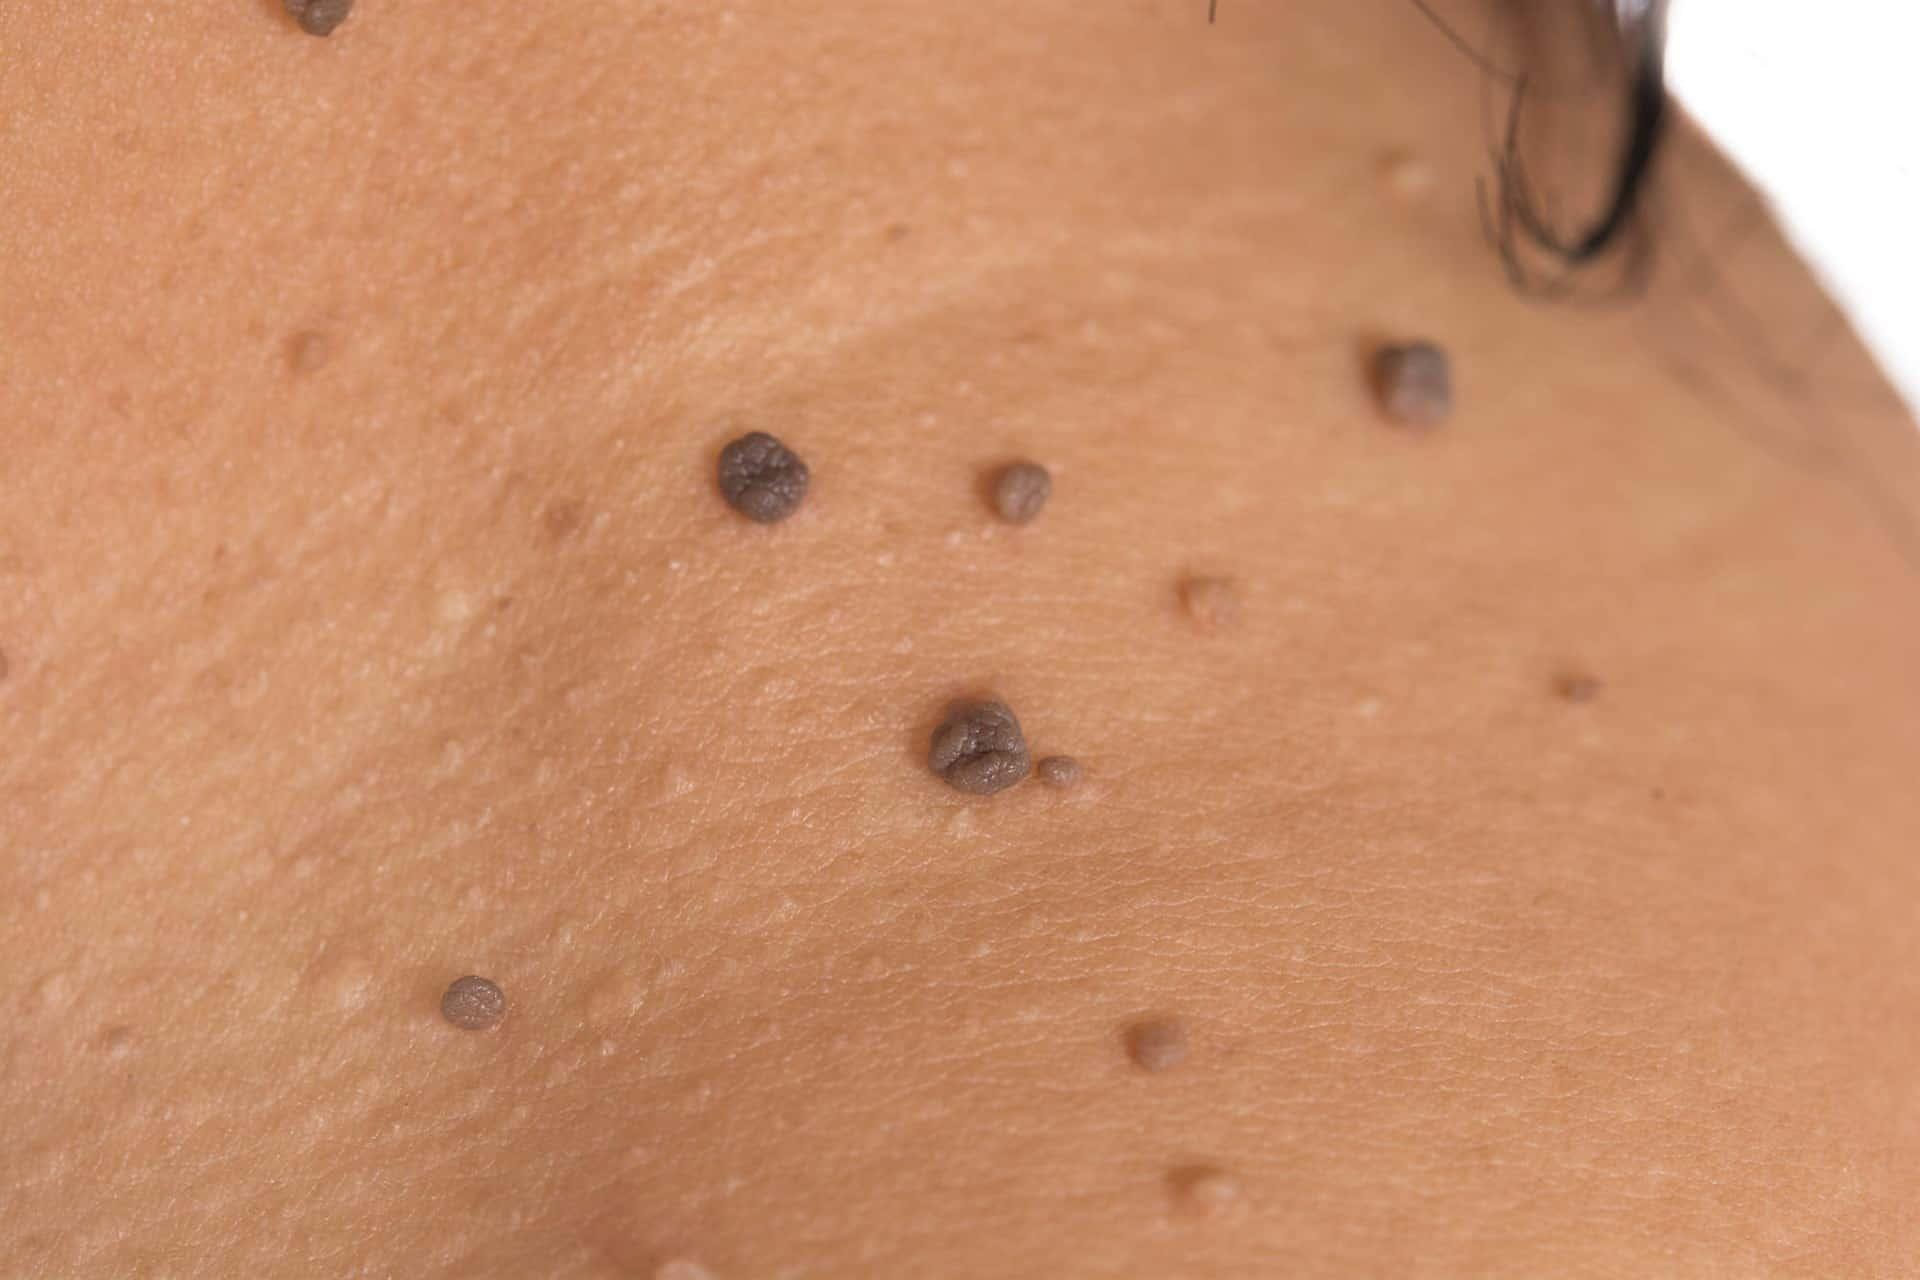 imagenes de papiloma humano en la cara human papillomavirus vaccine drug information